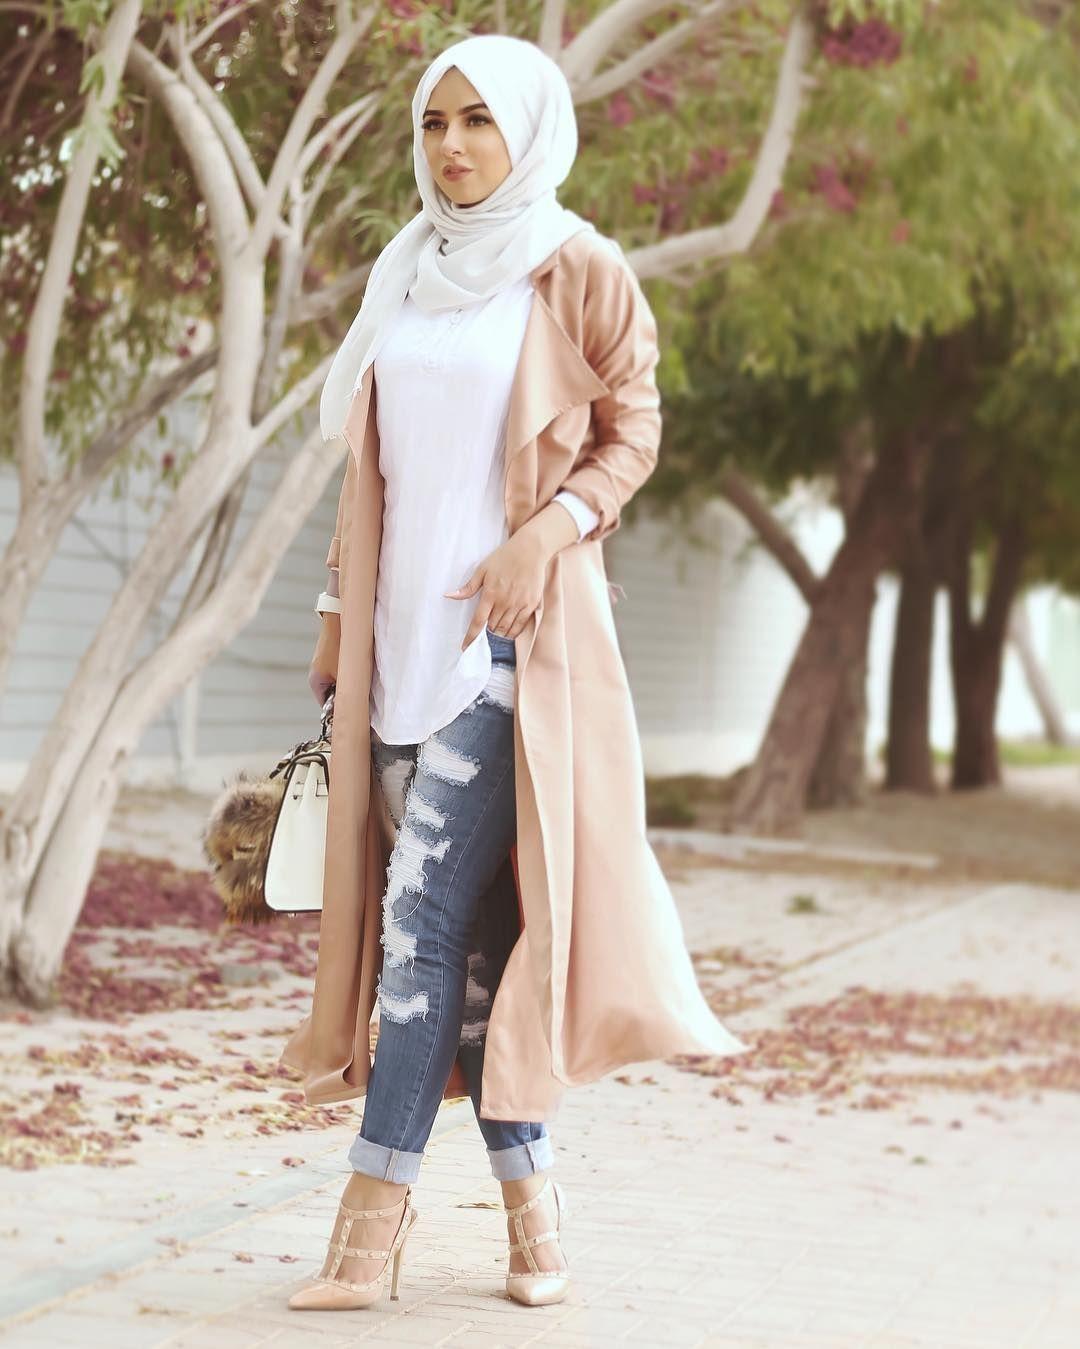 Just Own It Streetstyle Hijabfashion Fashionblogger